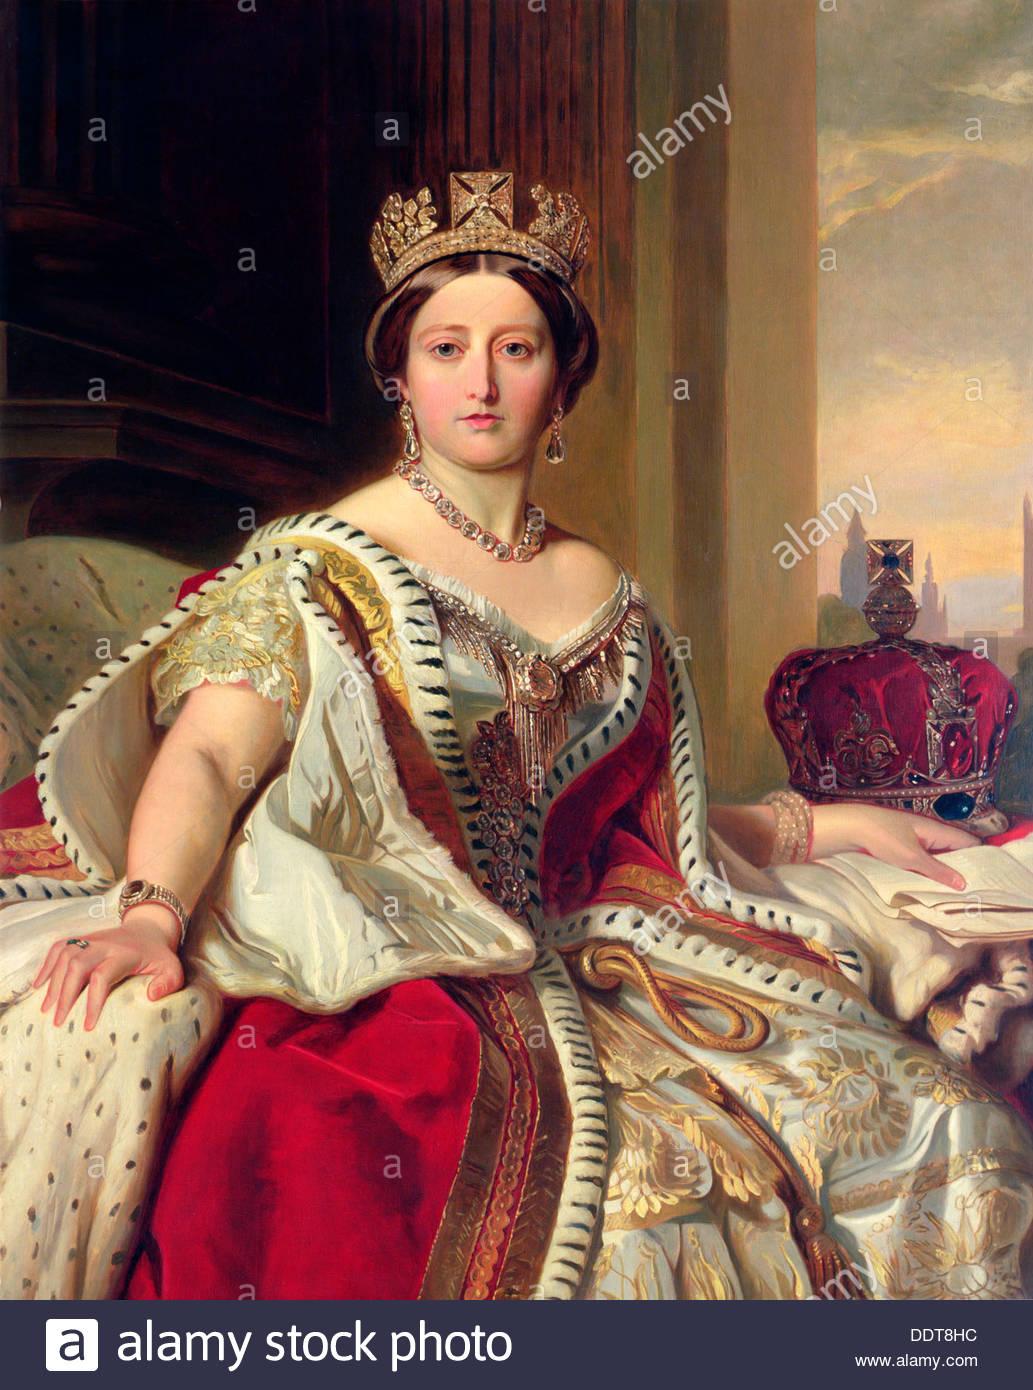 Queen Victoria Portrait Stock Photos & Queen Victoria Portrait.